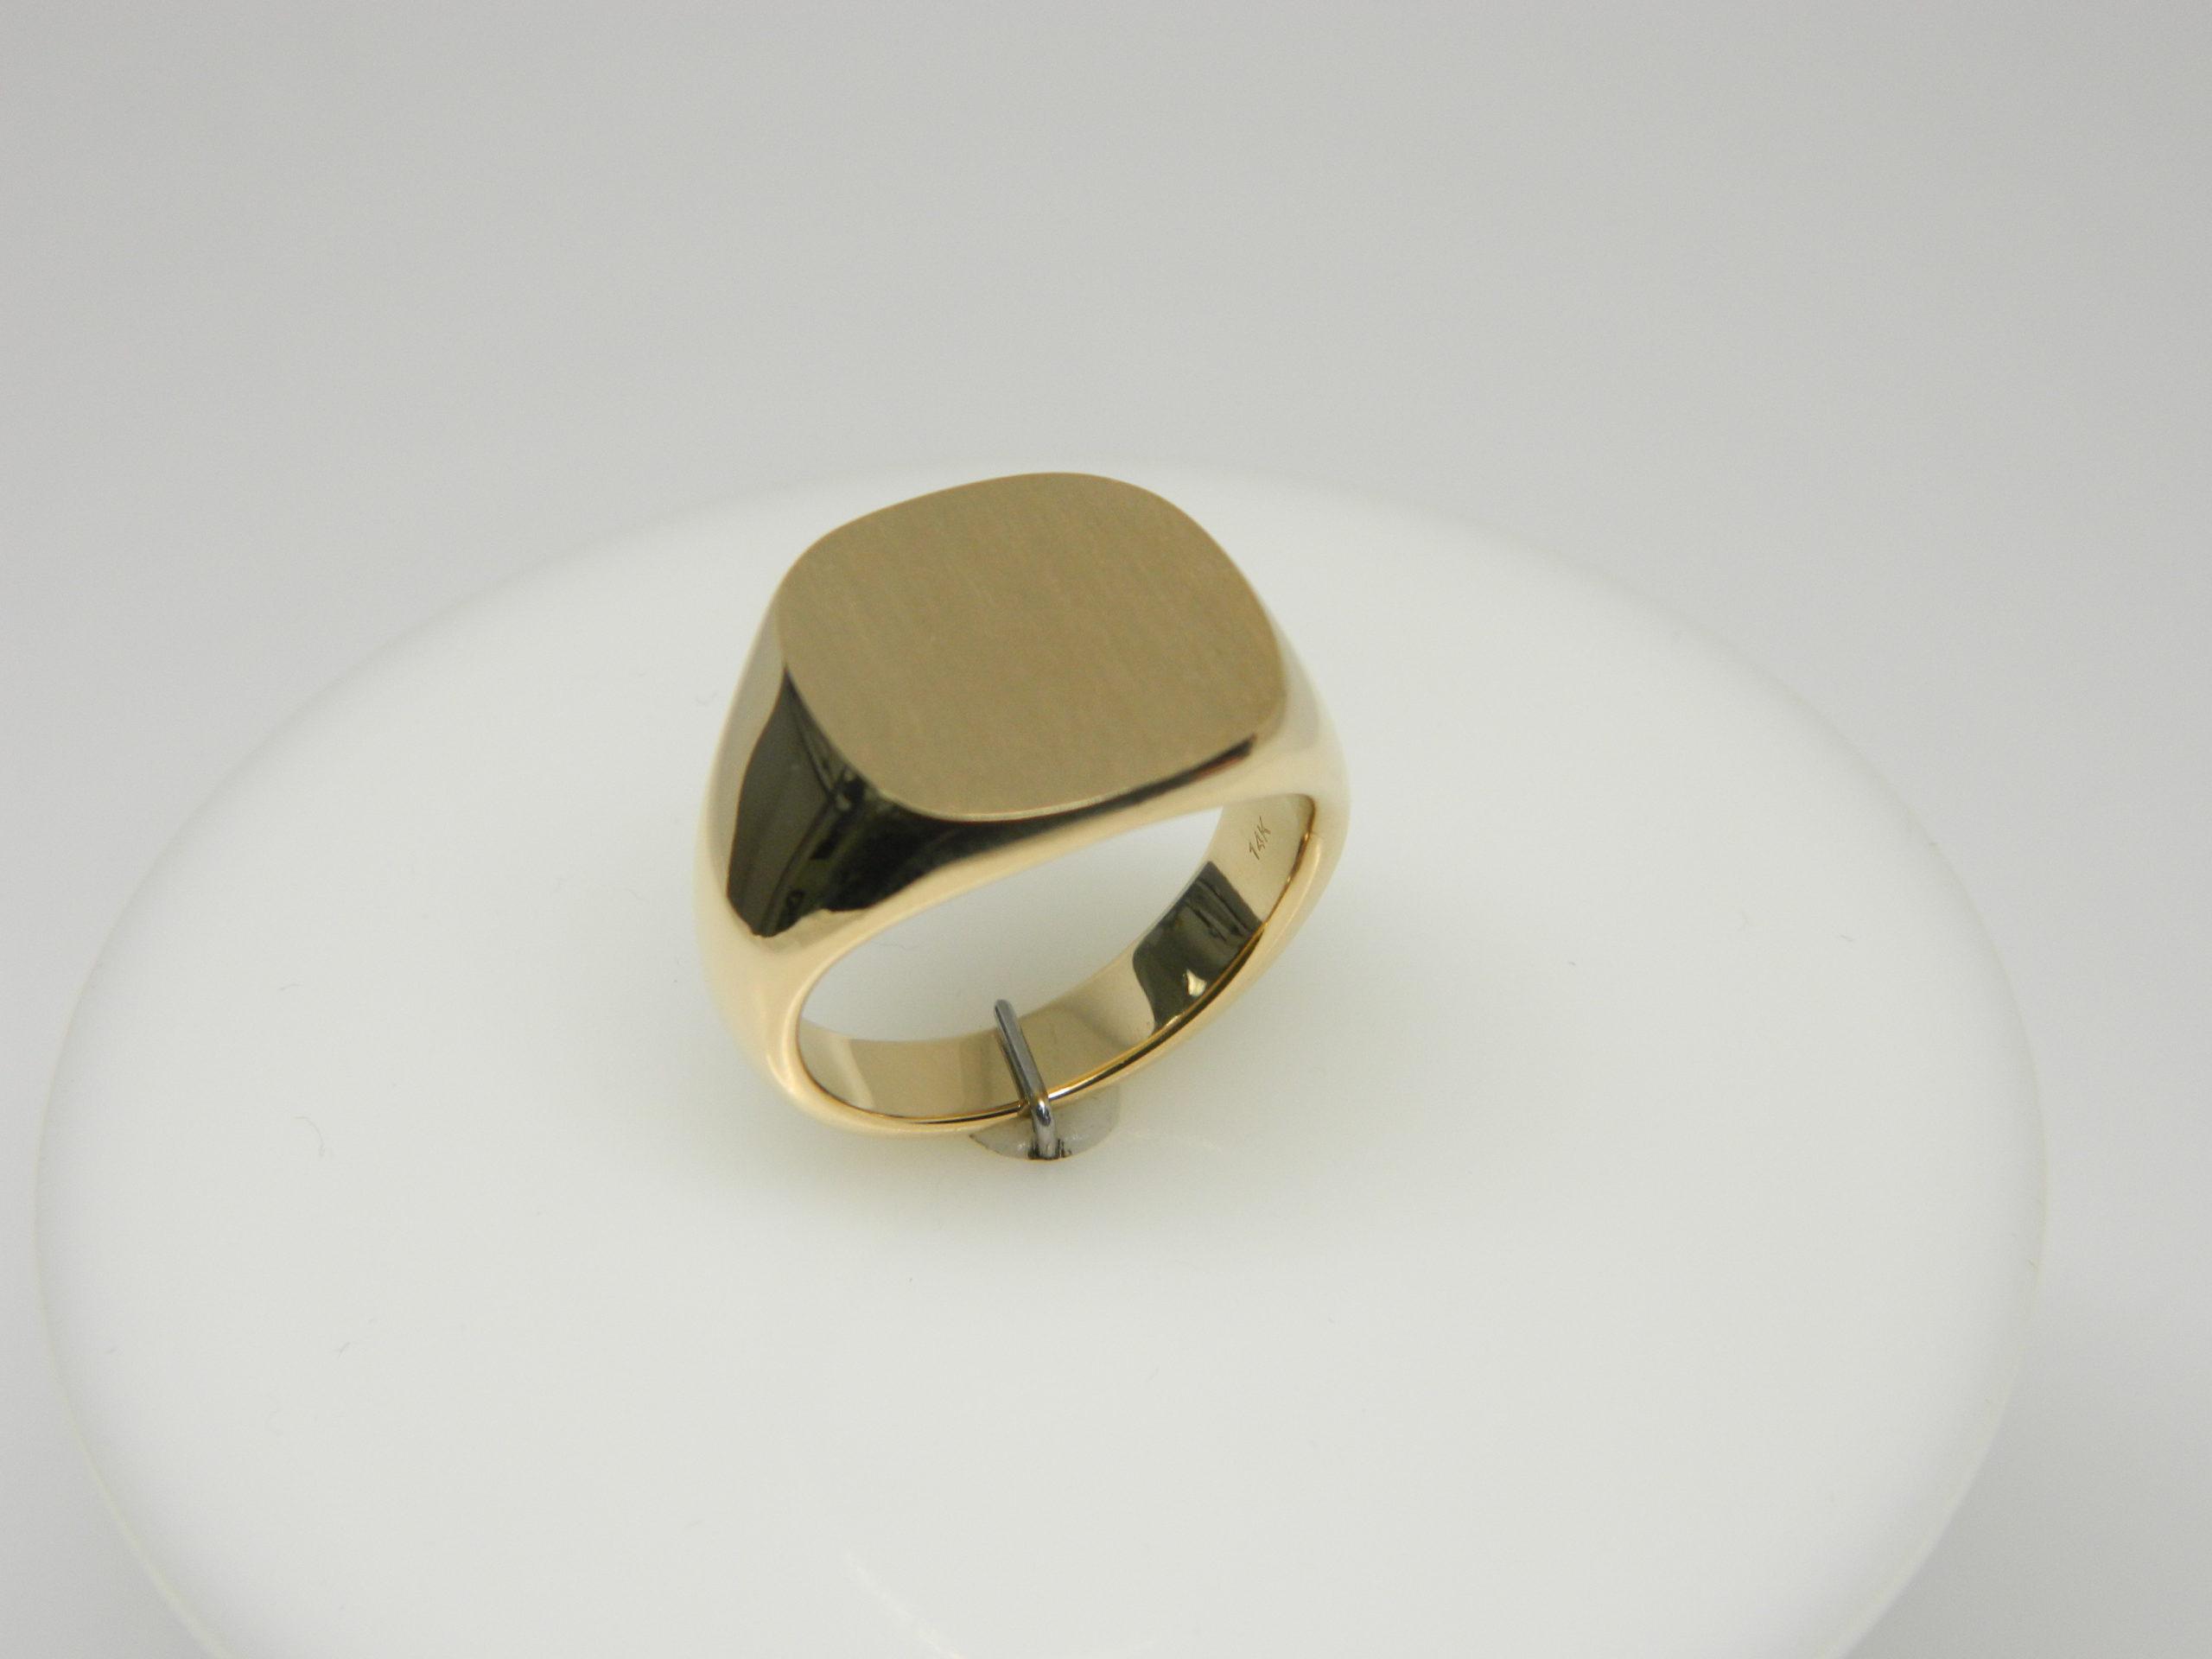 14 Karat Yellow Gold Bands Closed Back Men's Signet Ring- SZ10